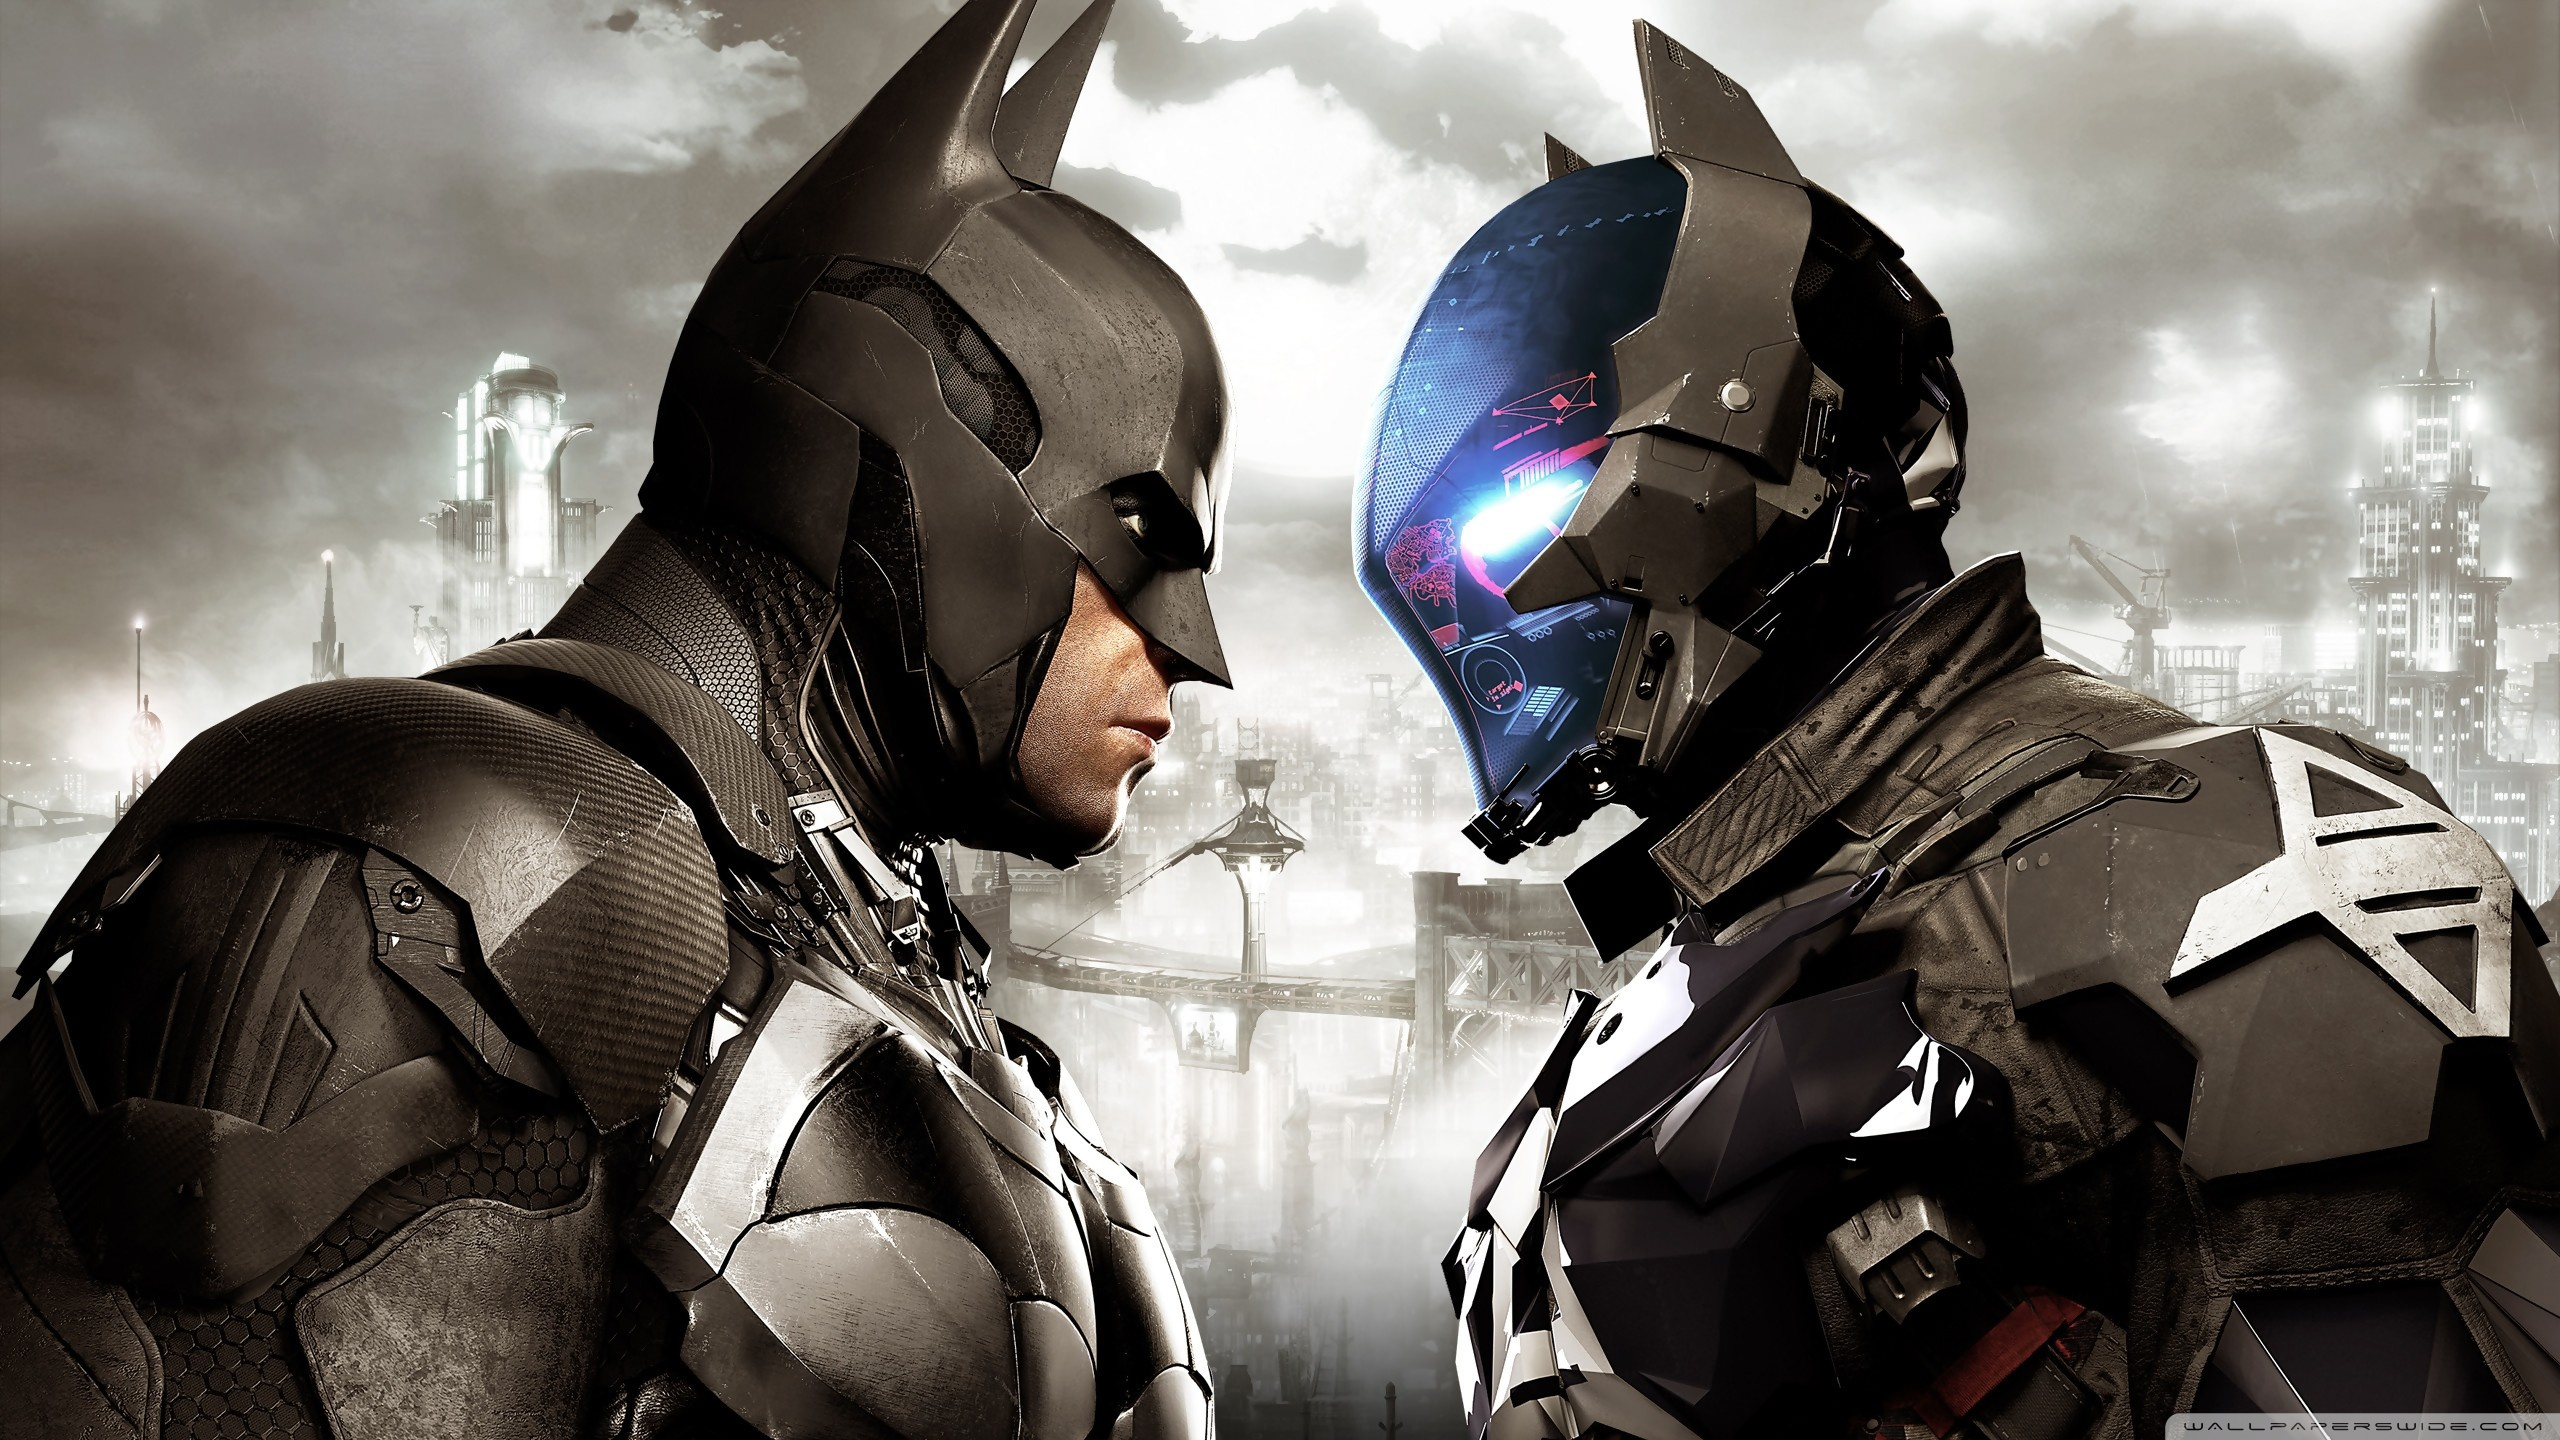 Batman Arkham Knight Hd Desktop Wallpaper Hd Wallpapers